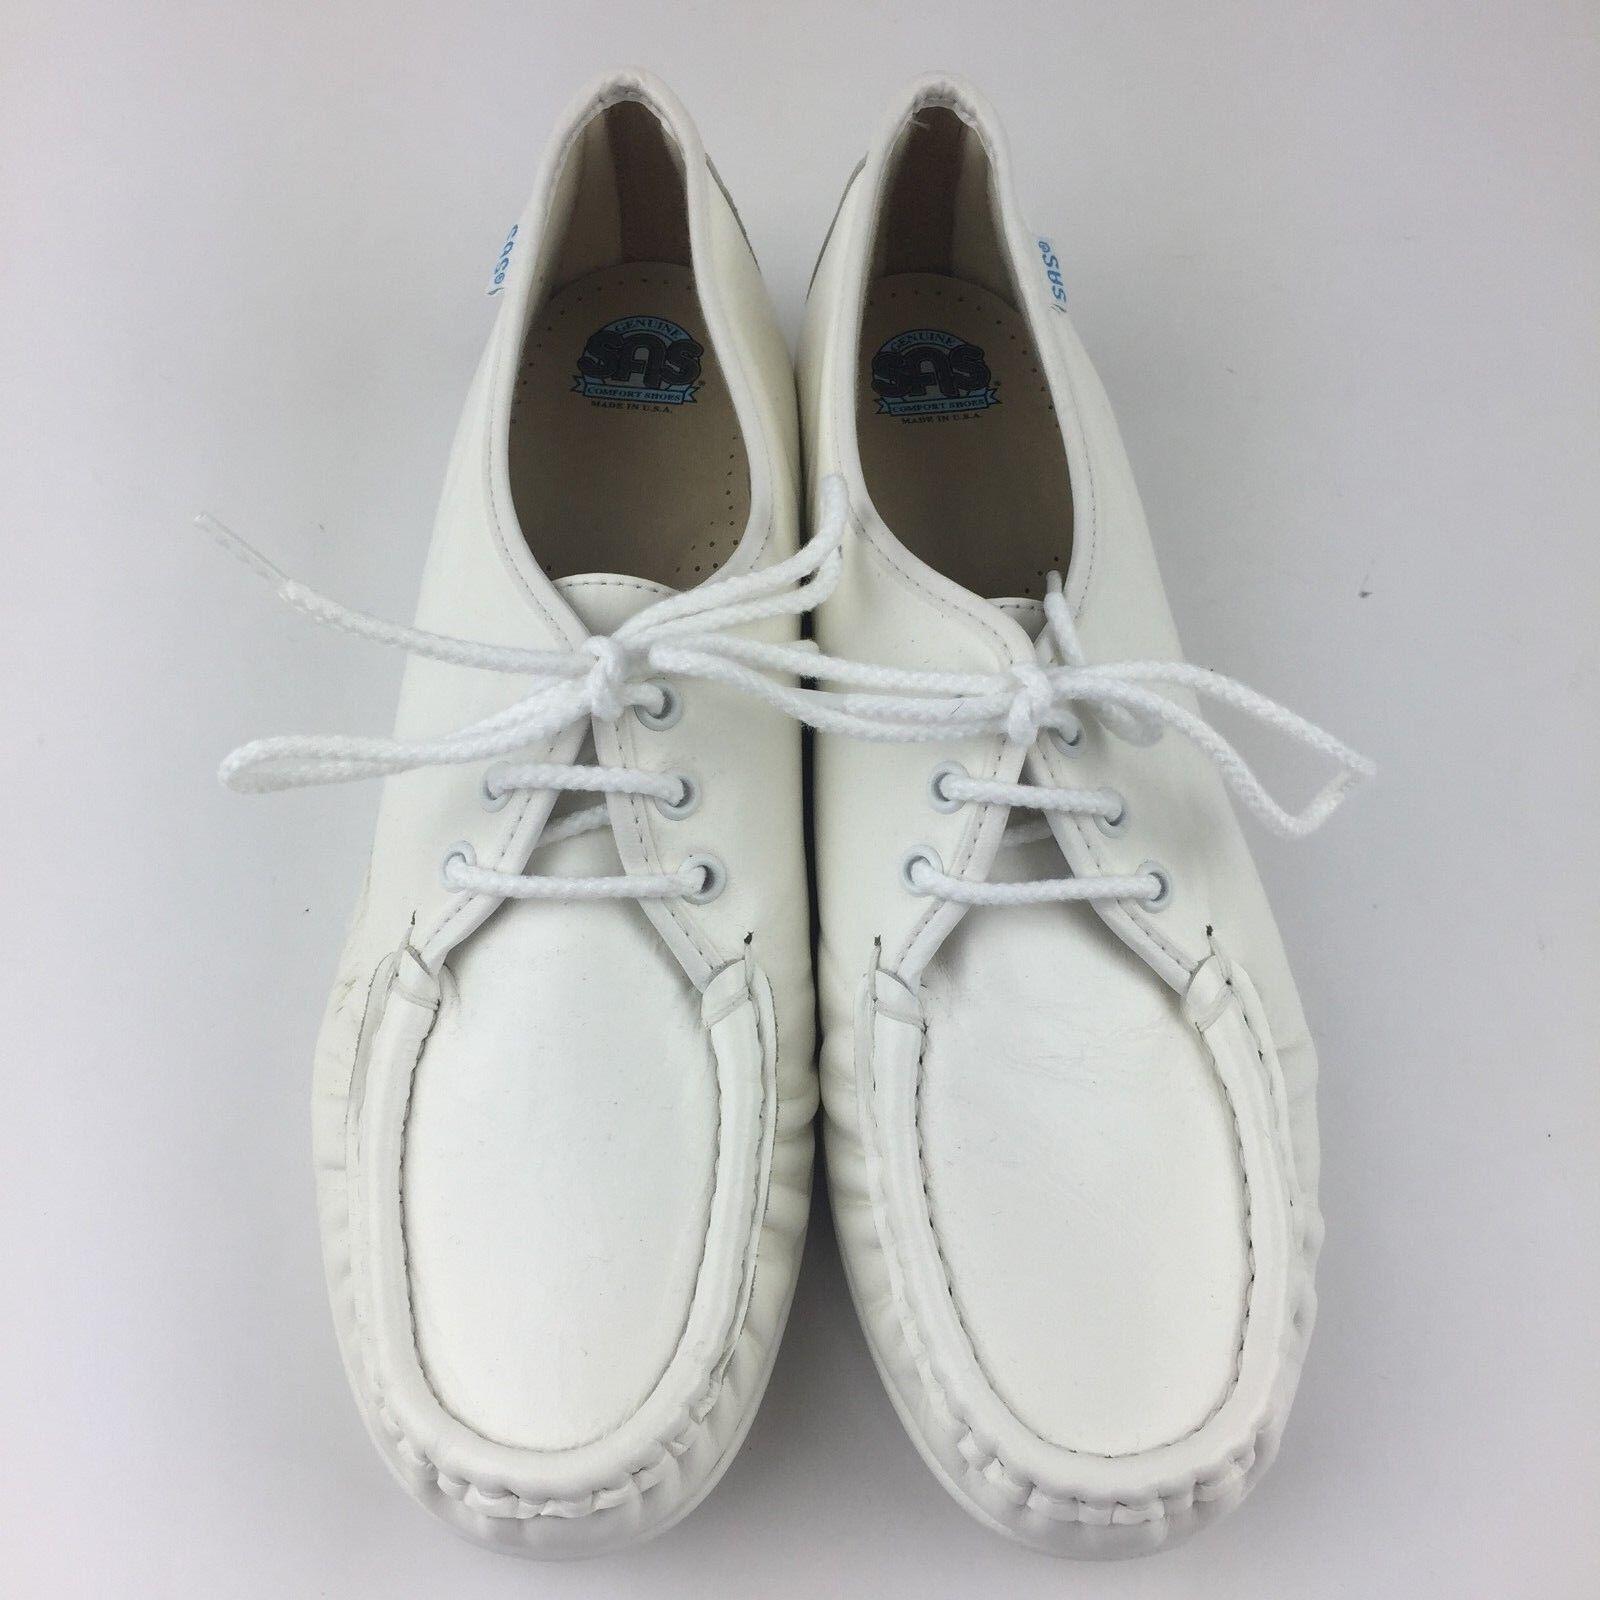 sas siesta femmes blanc 9,5 n du cuir blanc femmes de chaussures oxford dentelle vintage cc340f